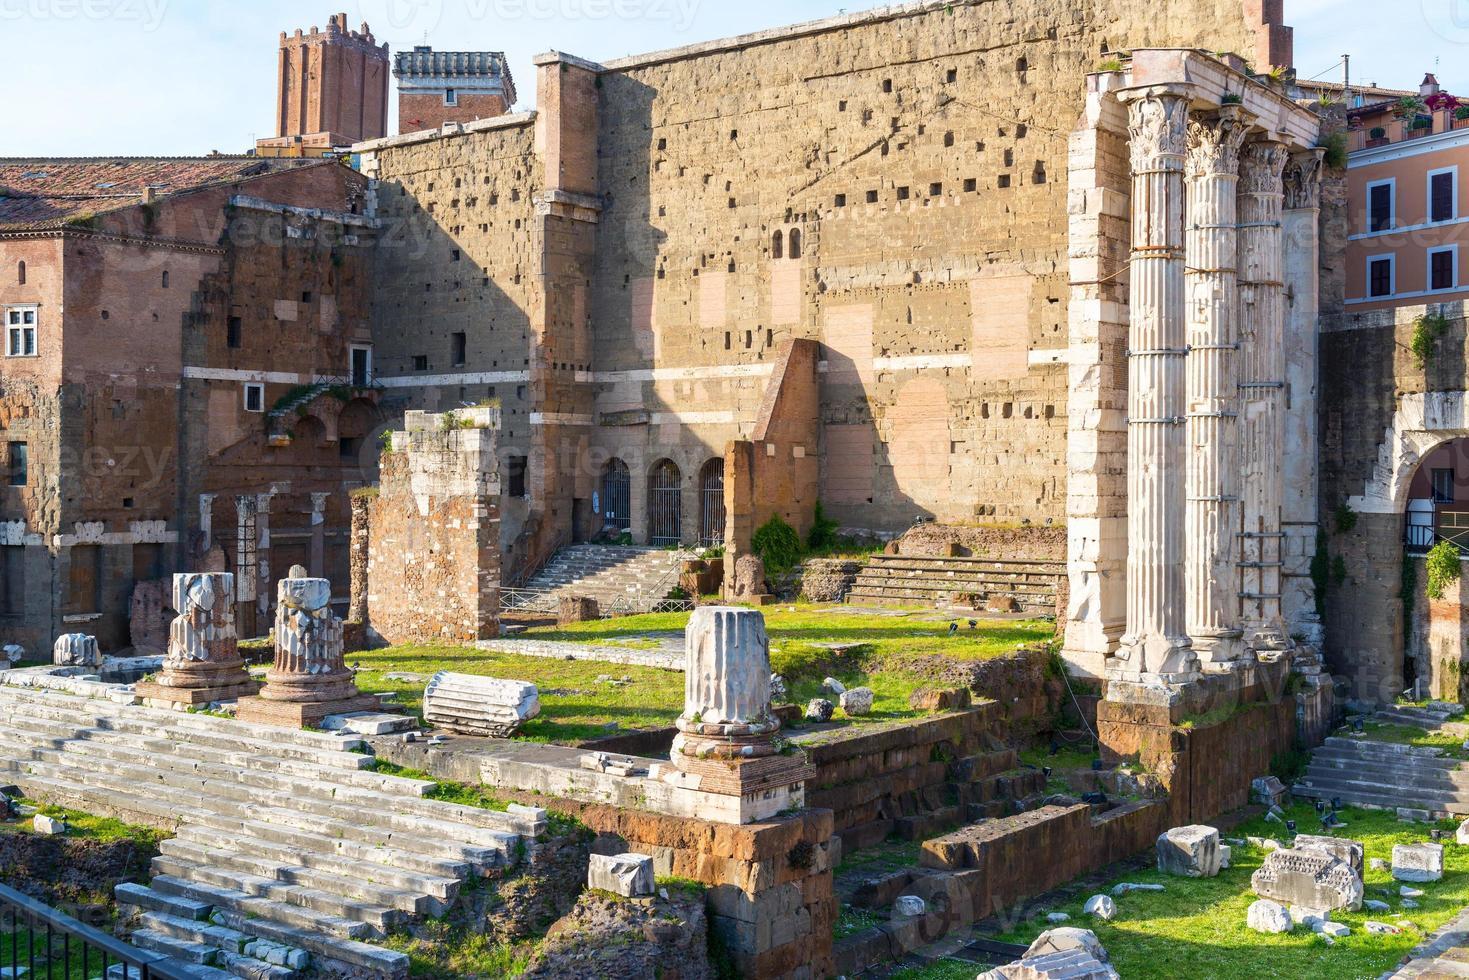 Forum of Augustus in Rome, Italy photo